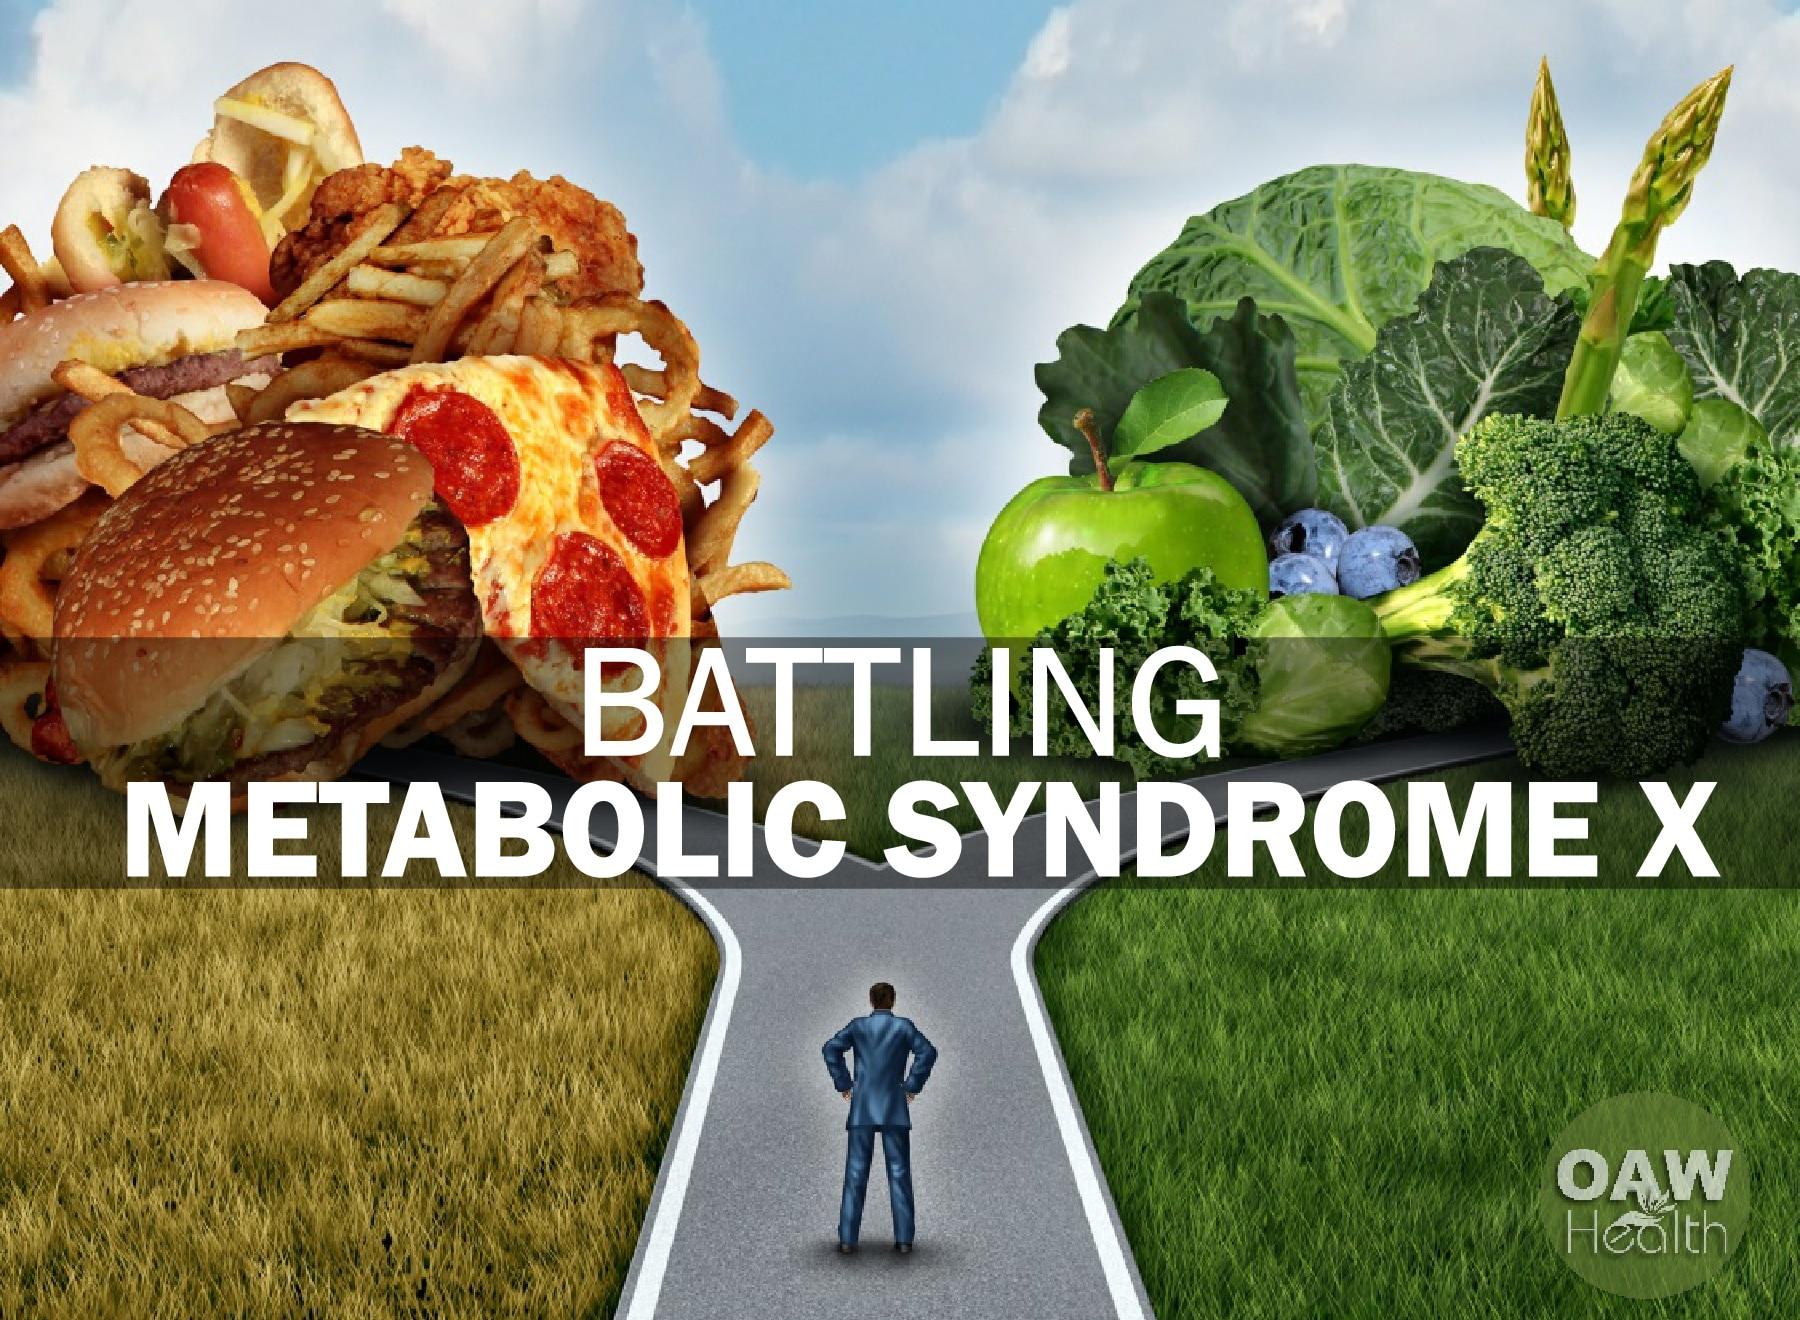 Battling Metabolic Syndrome X